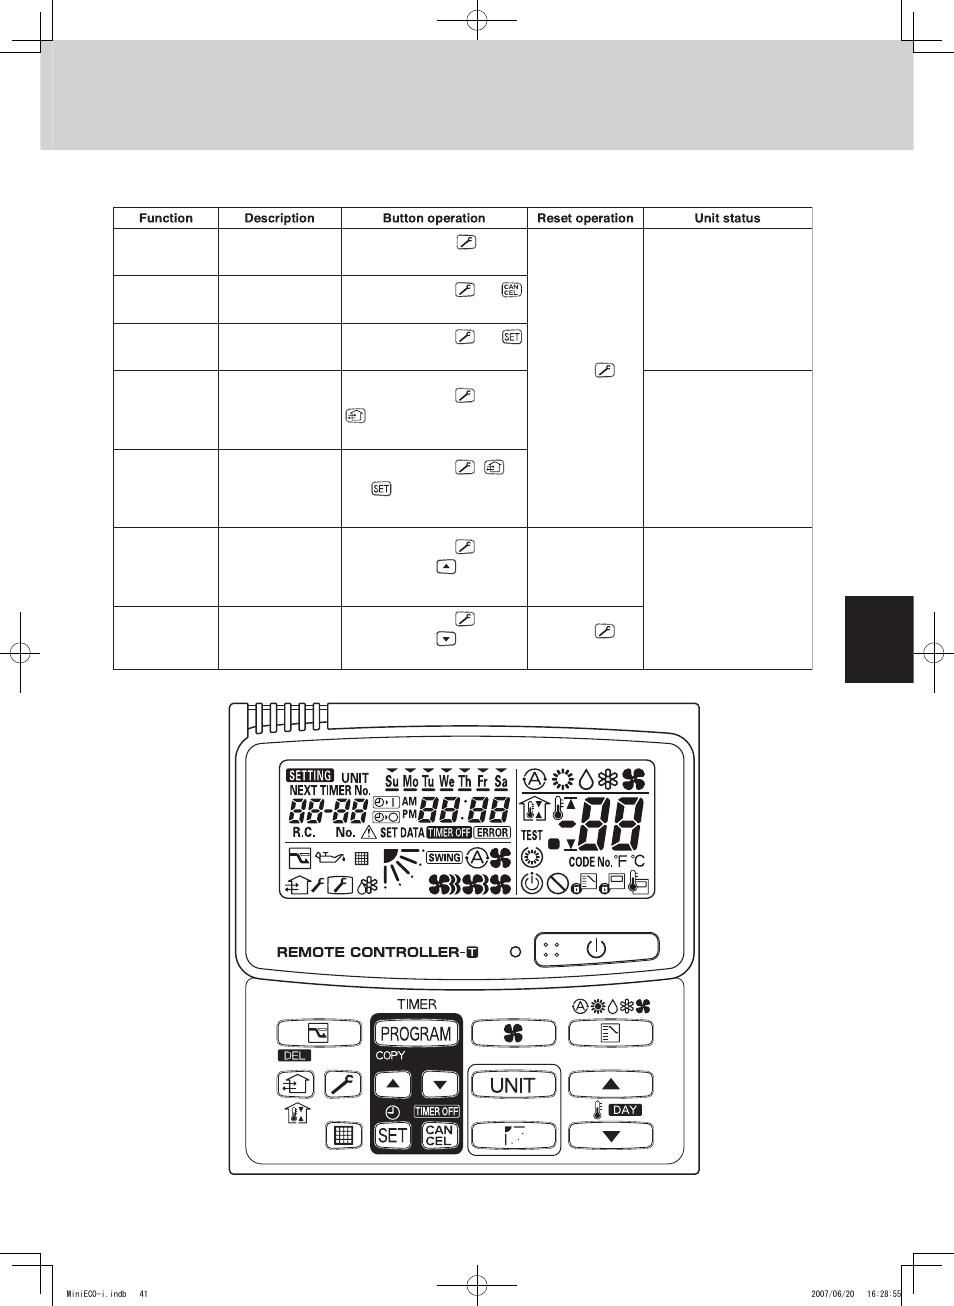 timer remote controller rcs tm80bg sanyo chx06052 user manual rh manualsdir com sanyo rcs tm80bg user manual sanyo rcs-tm80bg owners manual